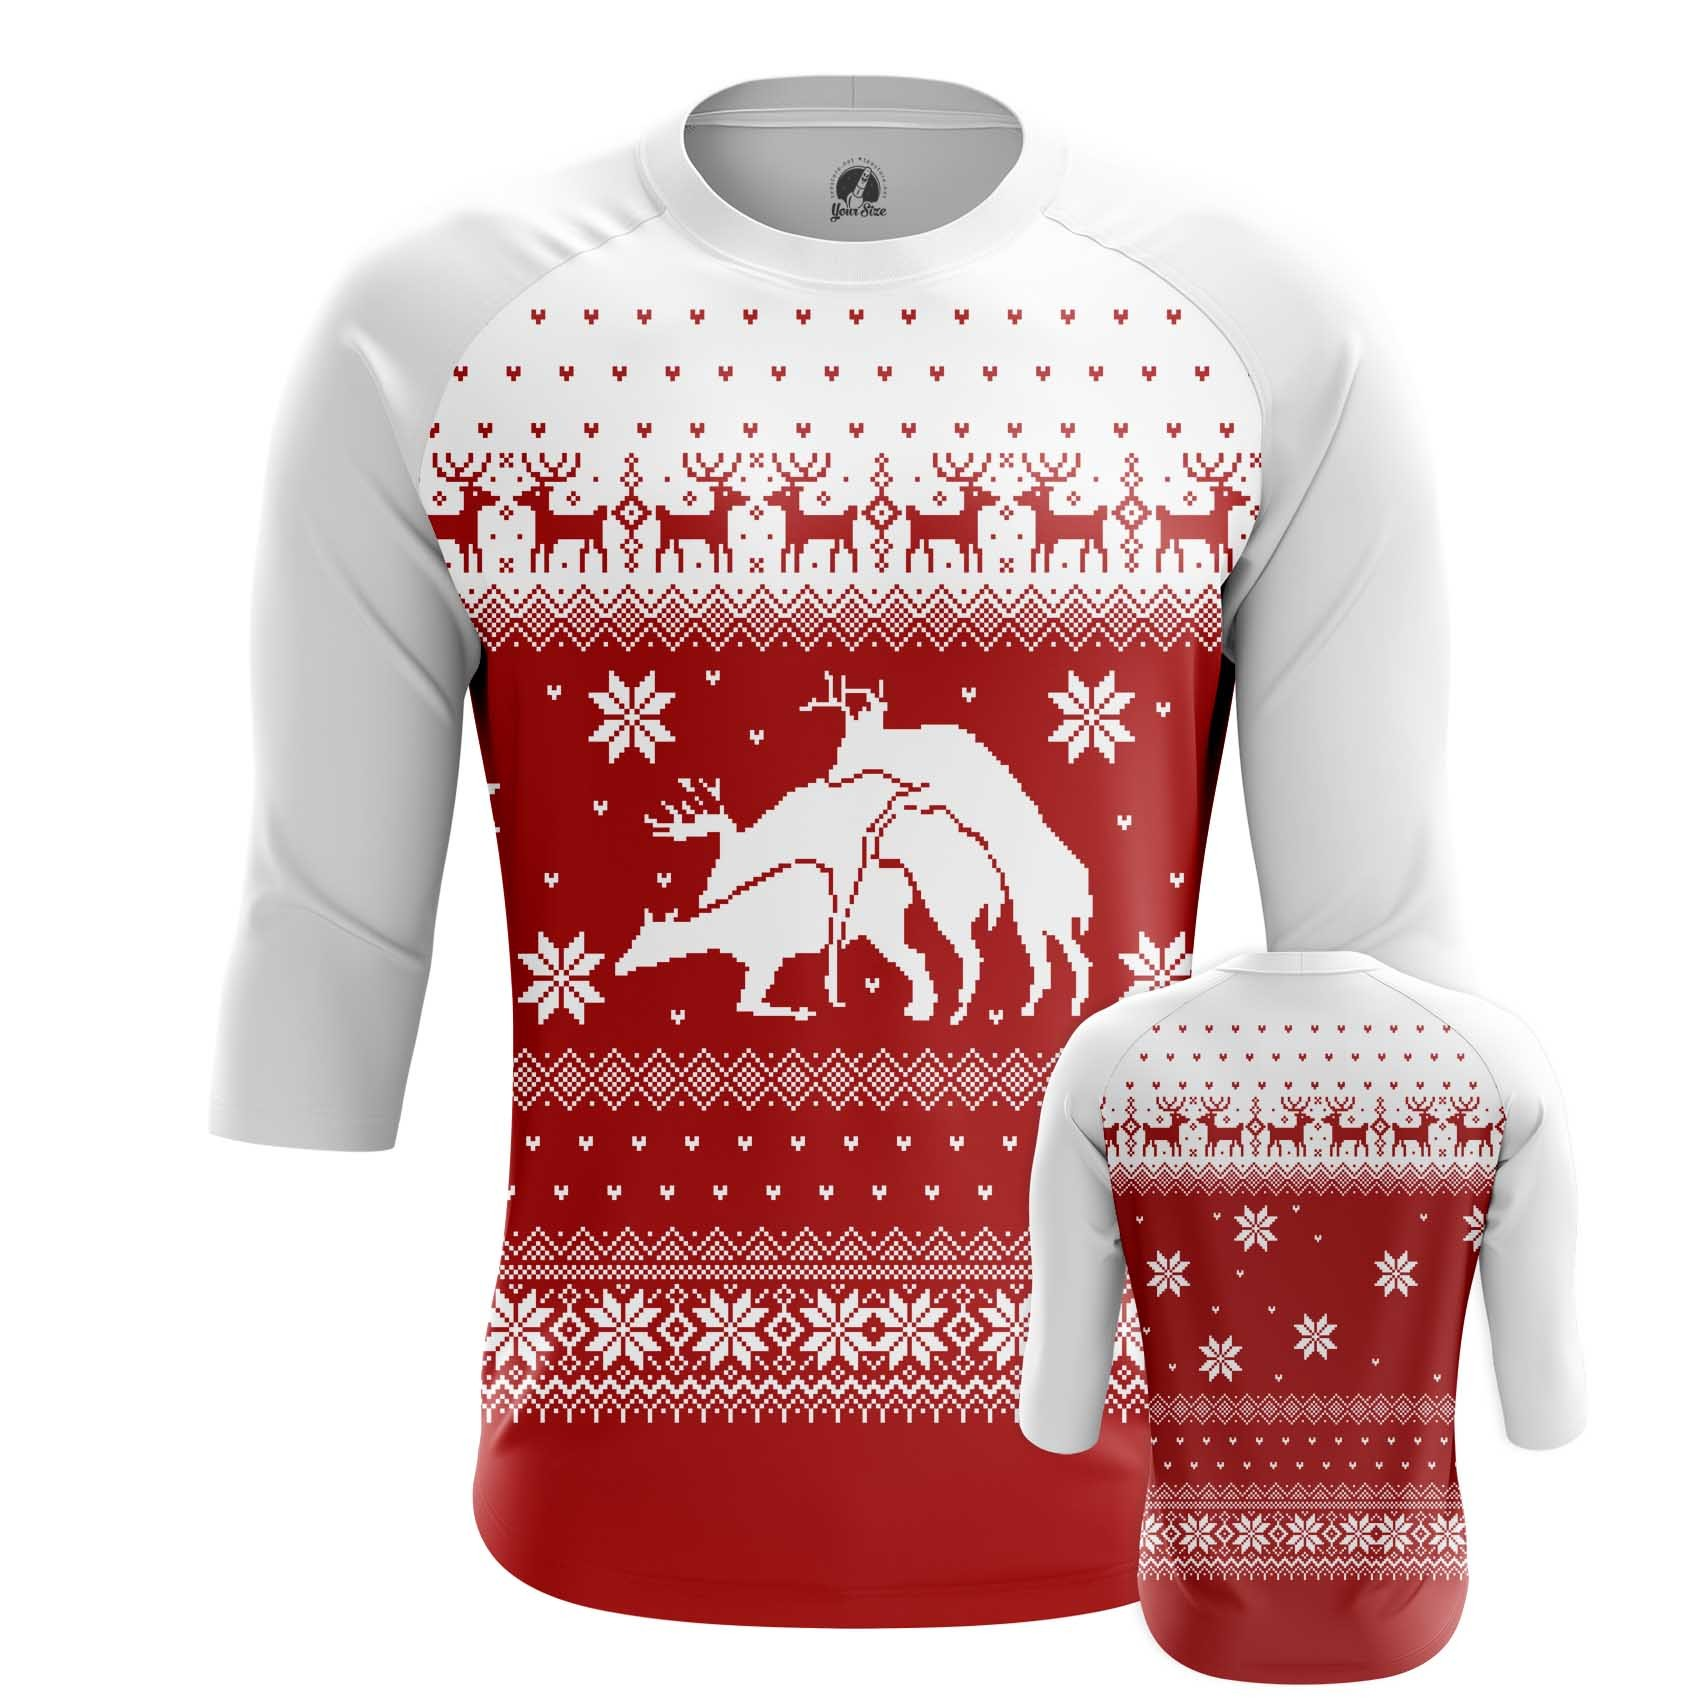 Merchandise Men'S T-Shirt Deers Christmas Sweater Santa Fun Art